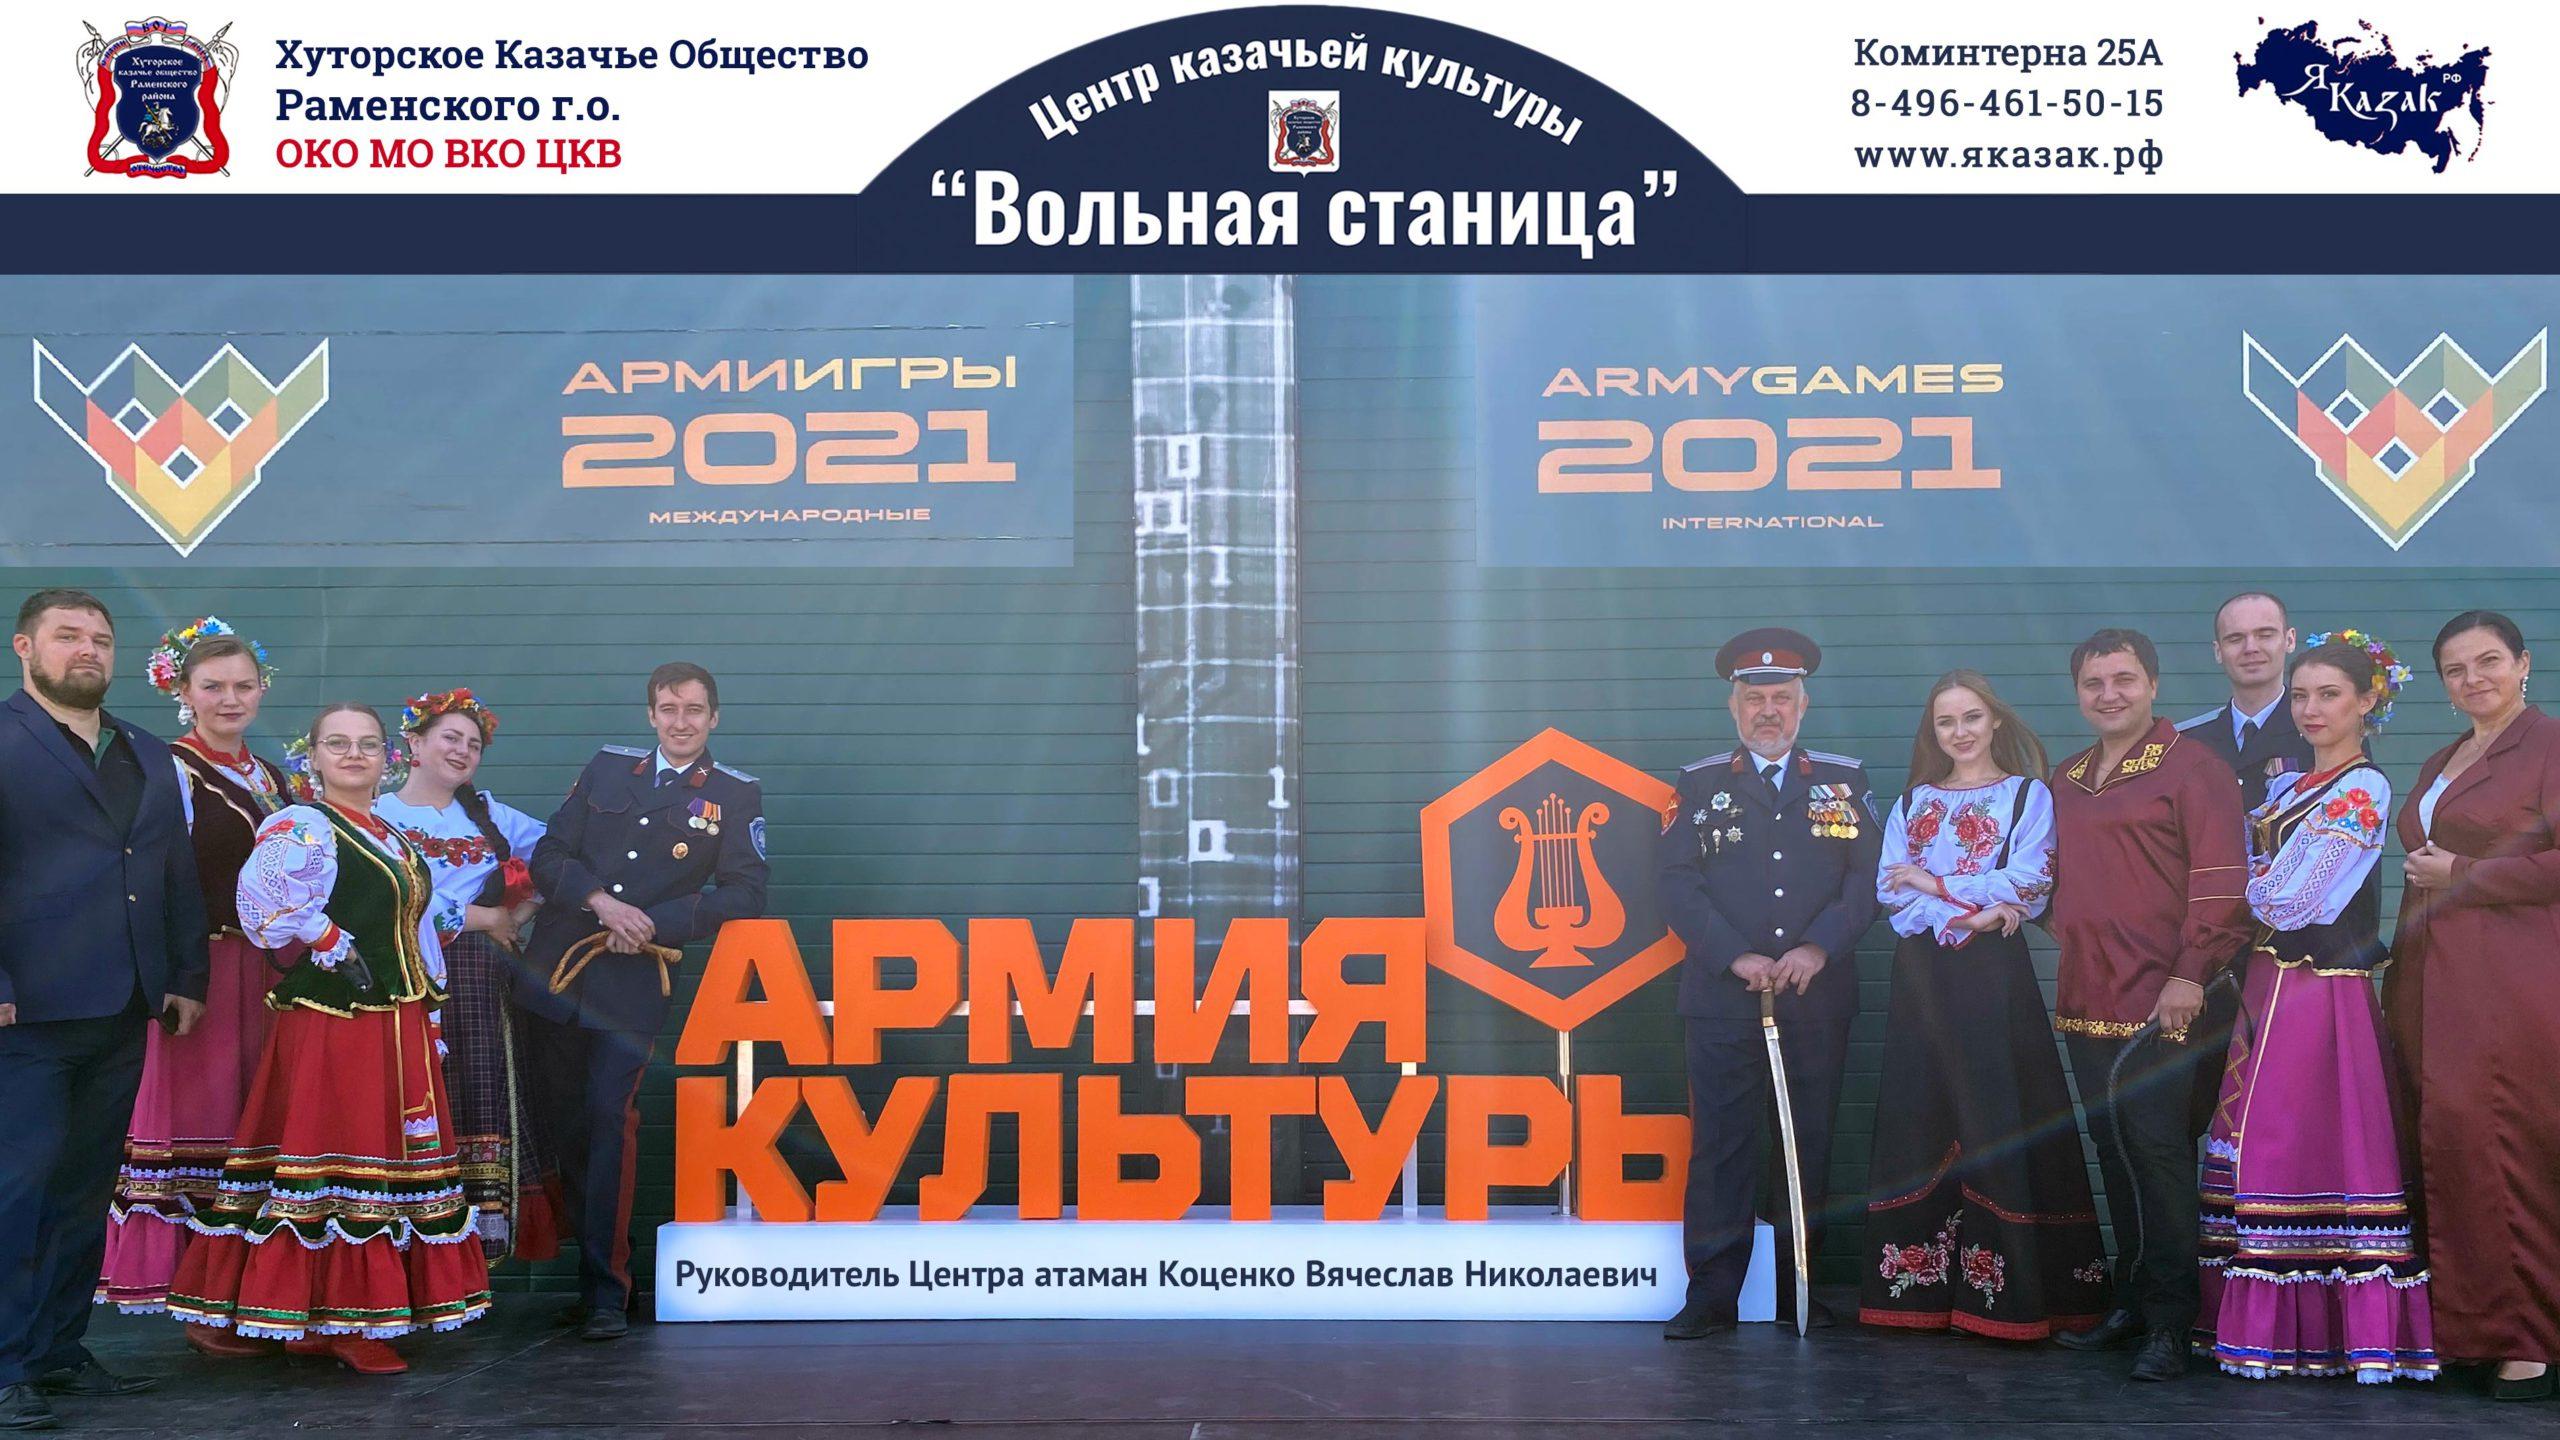 ЦКК «Вольная станица» на закрытии форума «Армия-2021»